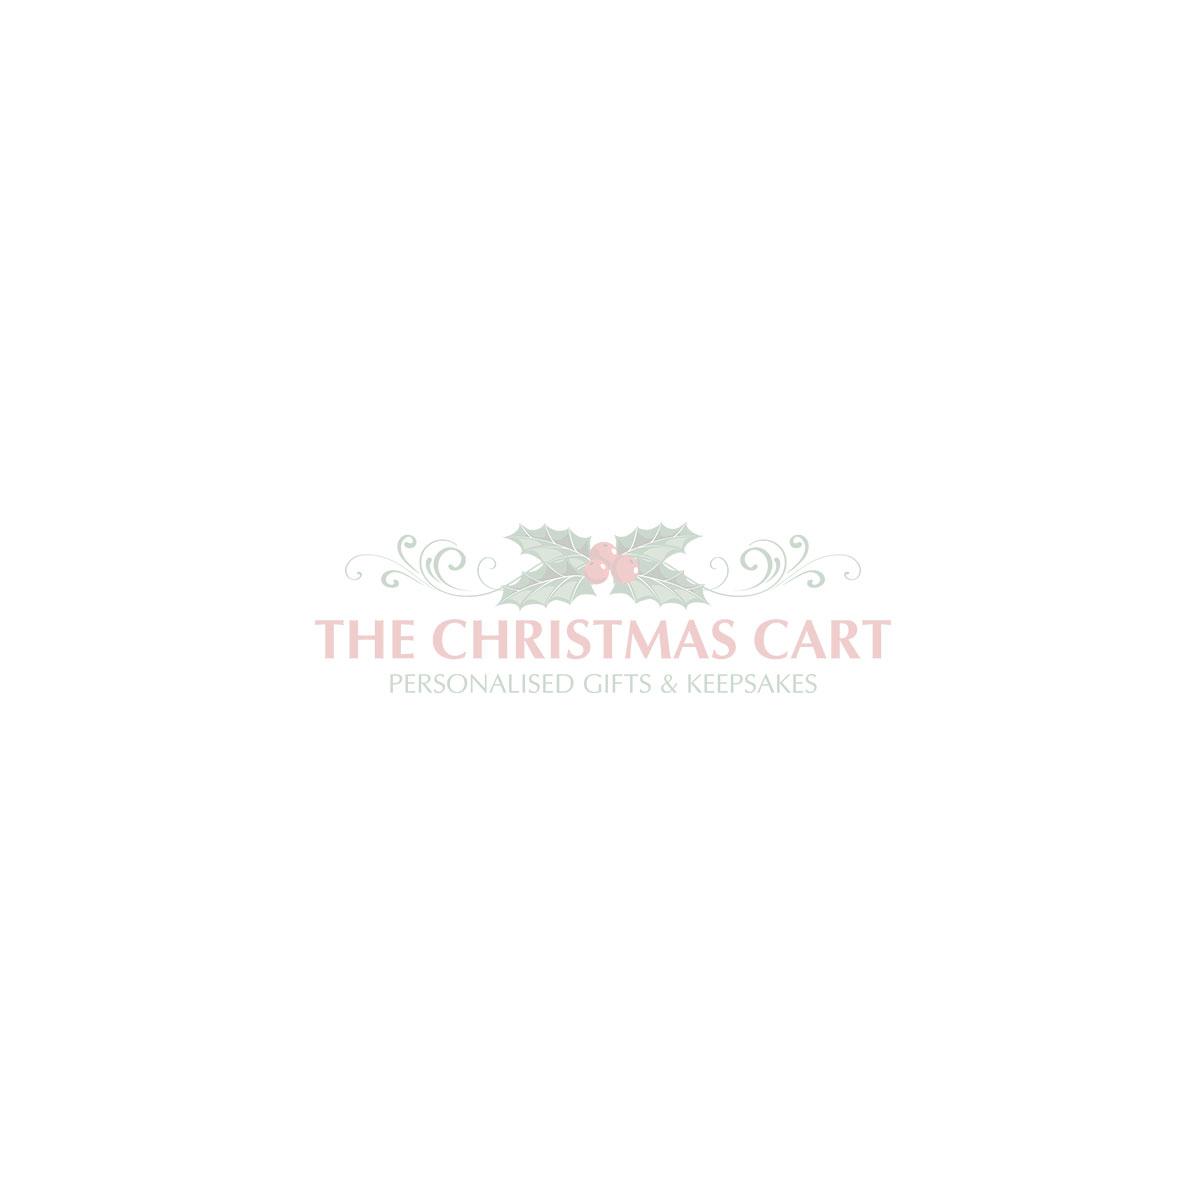 Merry Christmas Bo Ho Ho Christmas Wreath Plaque